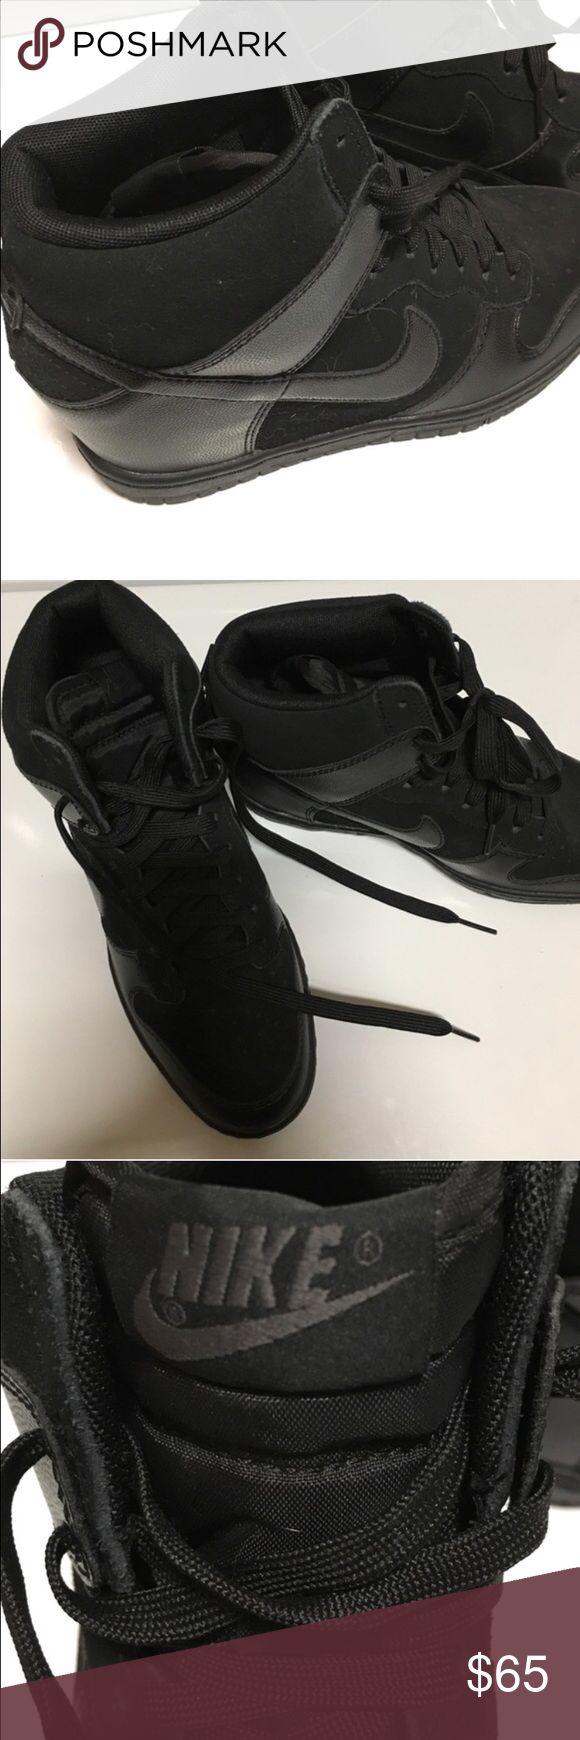 Black Nike Sky Hi Wedge Sneakers Like new condition, super cute wedge tennis shoes. All black. Nike Shoes Sneakers